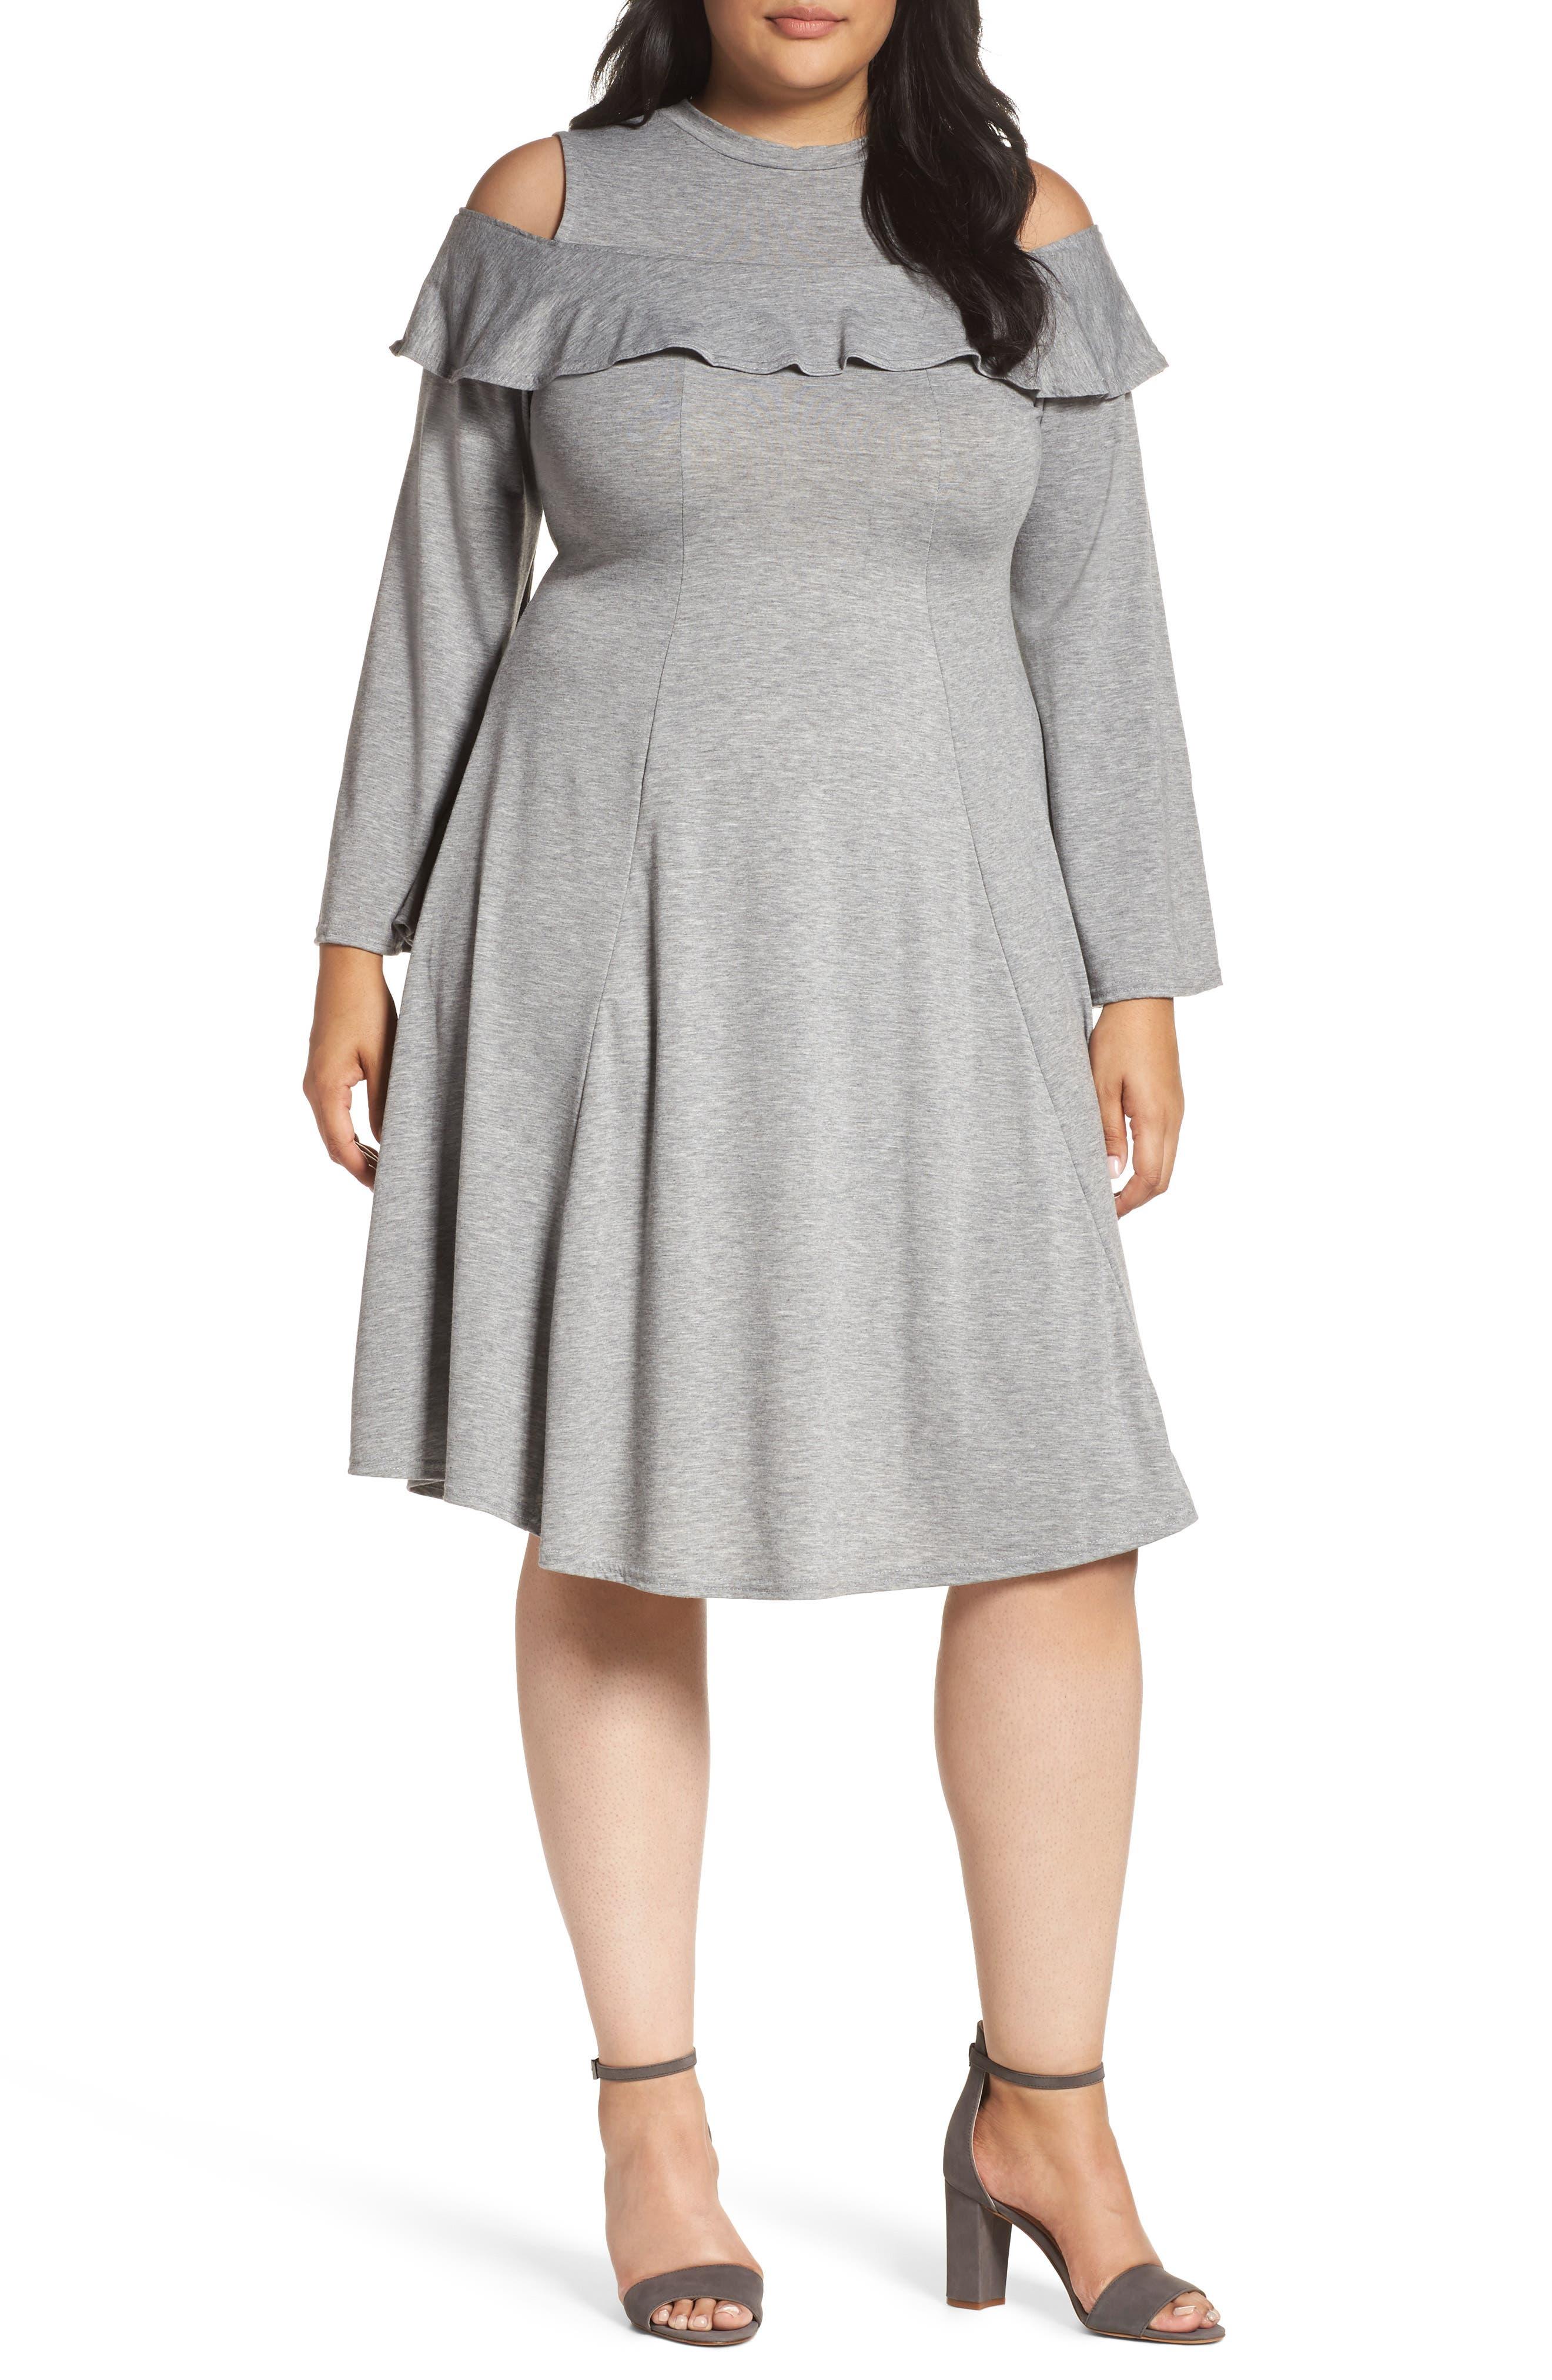 LOST INK Jersey Fit & Flare Dress (Plus Size)